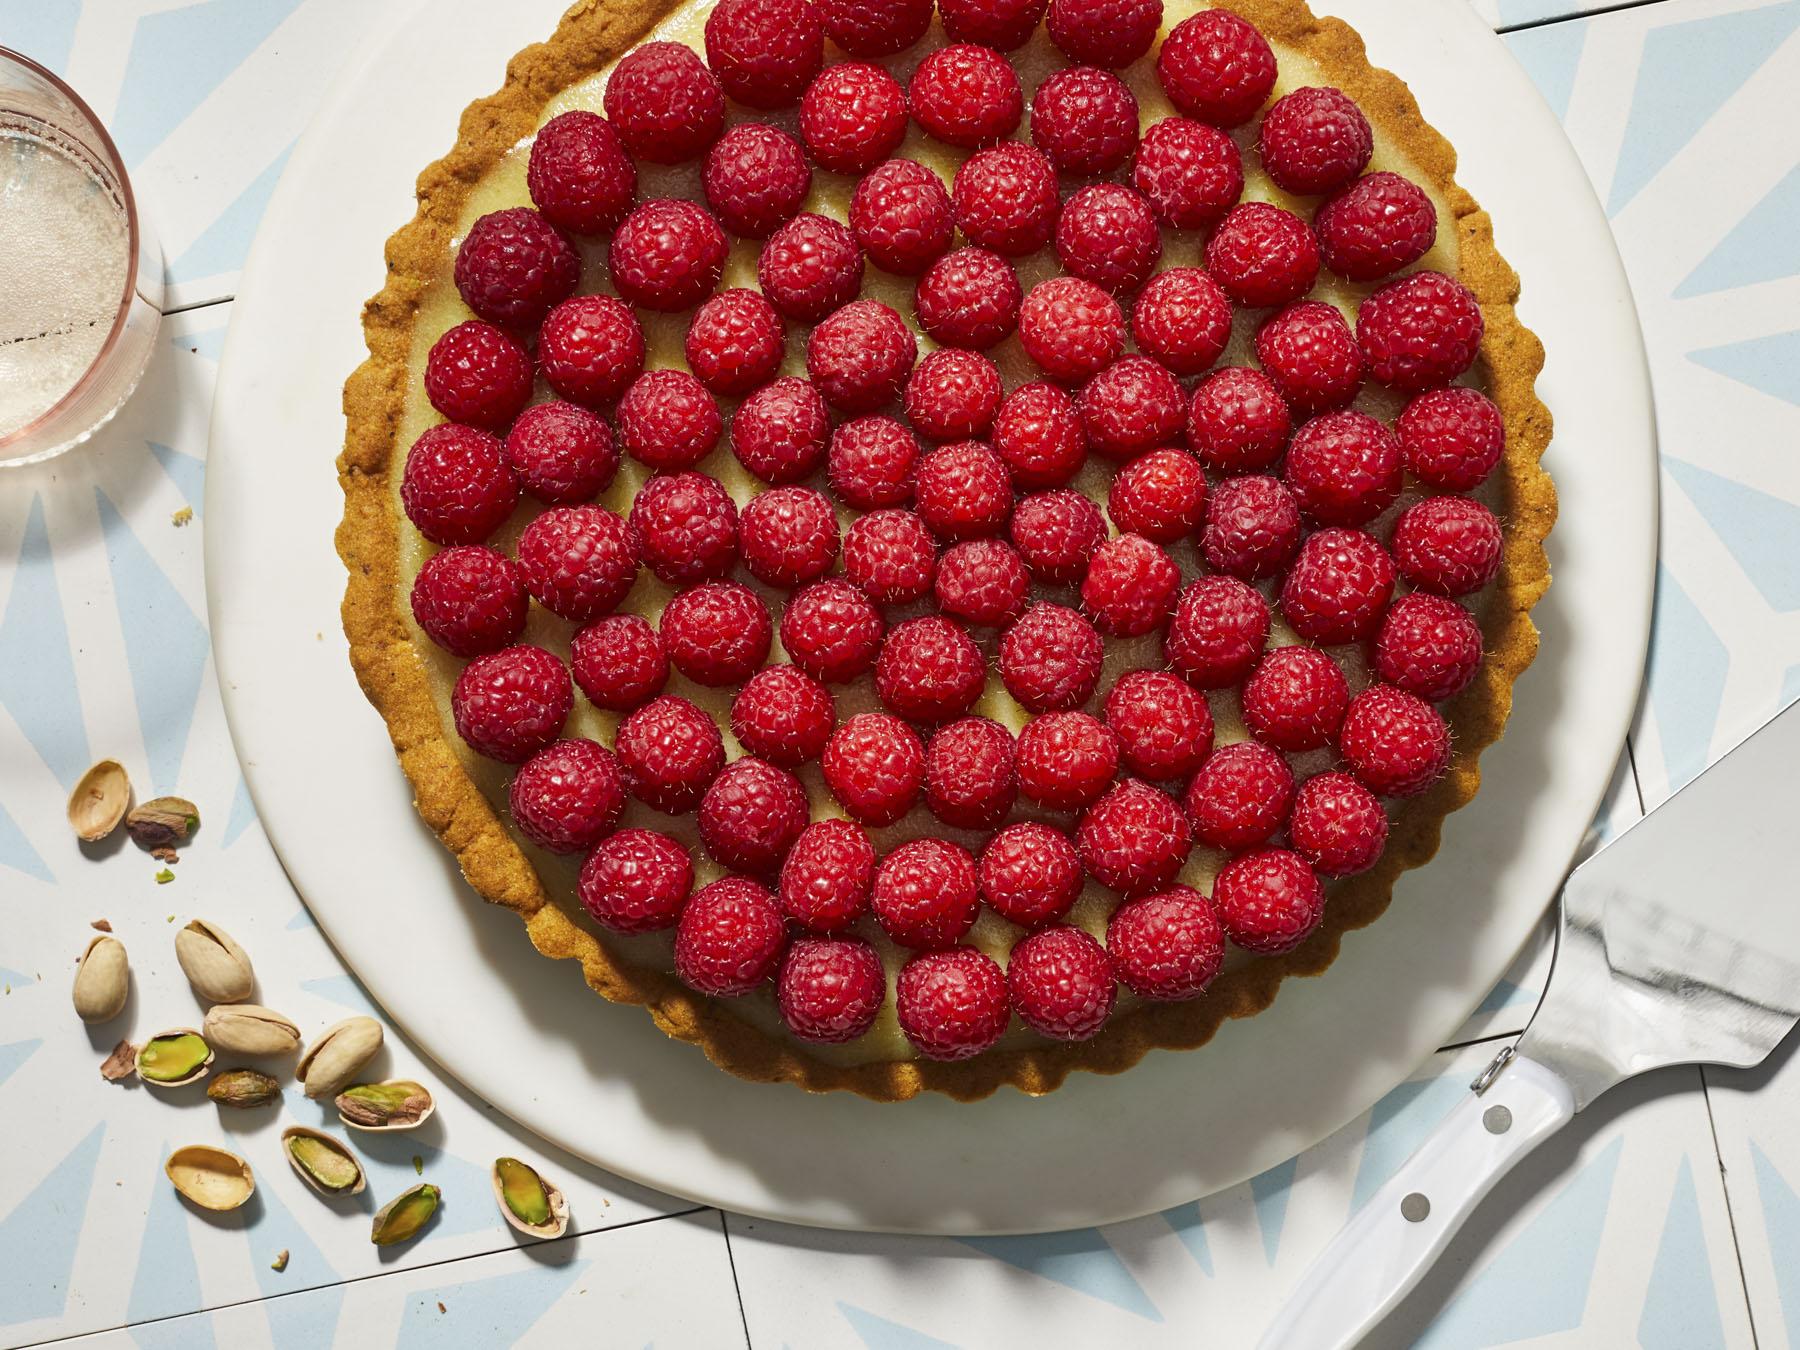 Raspberry-Lime Tart with Pistachio Crust